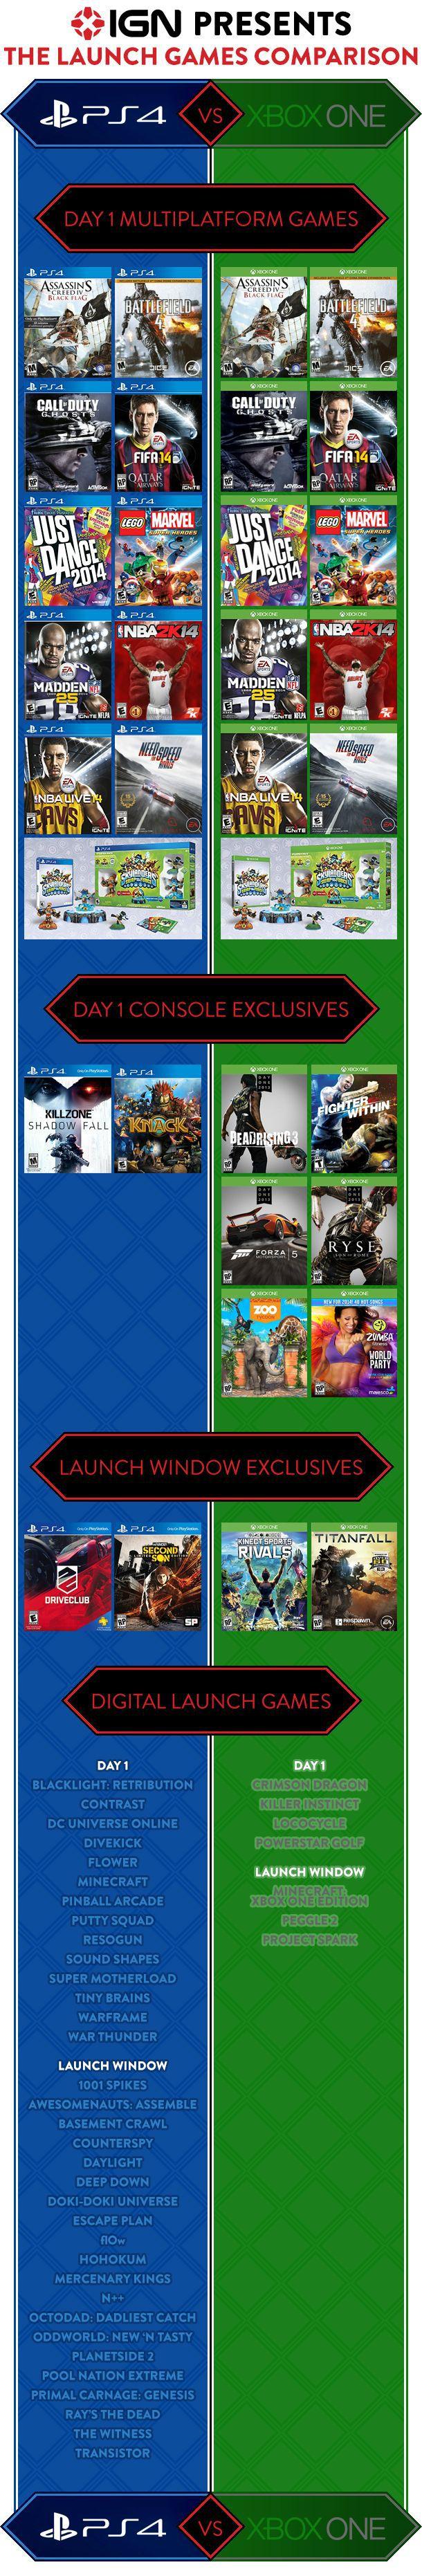 PS4 vs. Xbox One Launch Spiele im Vergleich